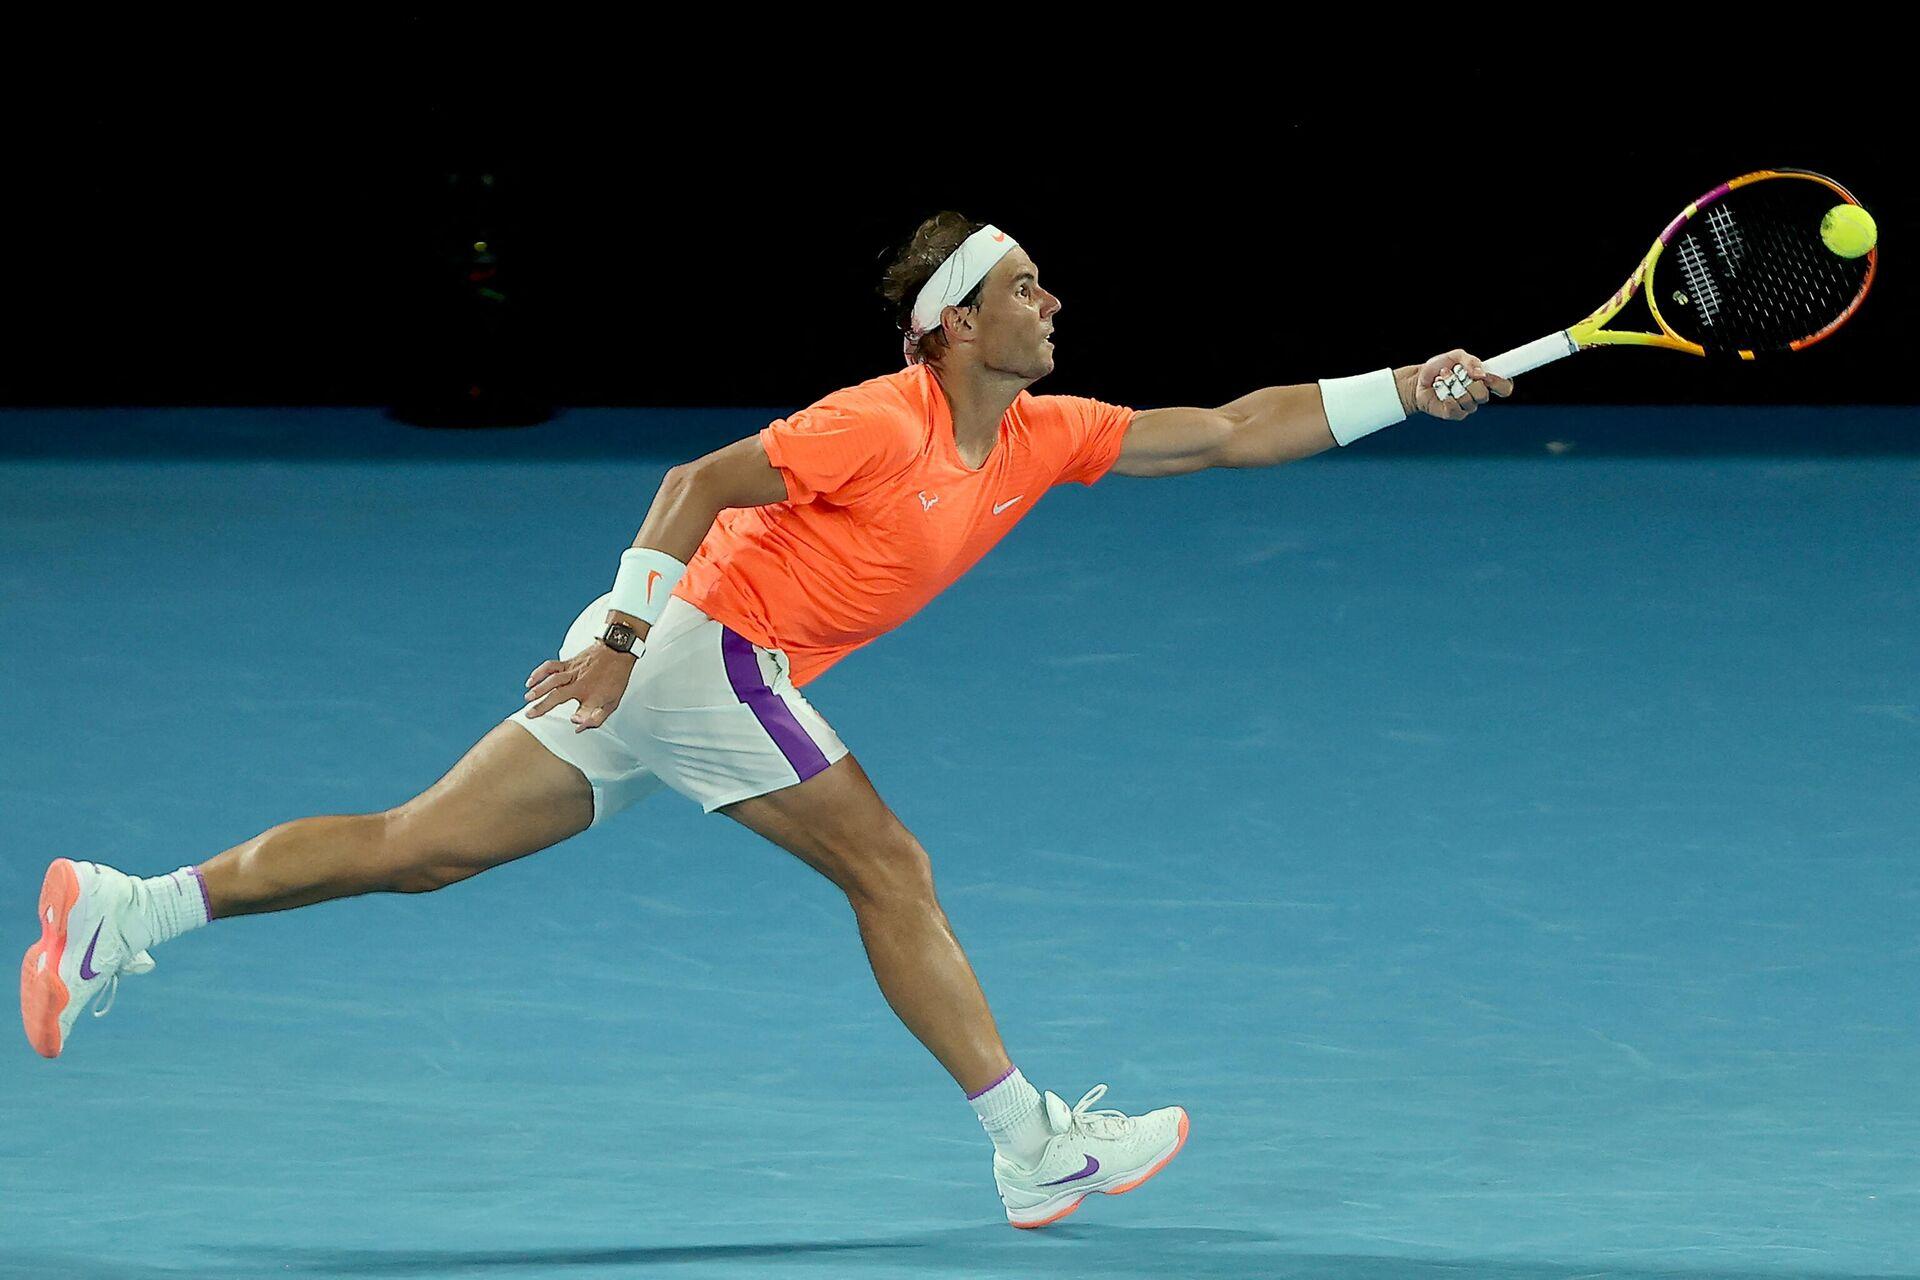 Rafa Nadal durante el partido de cuartos del Open de Australia 2021 ante Tsitsipas - Sputnik Mundo, 1920, 17.02.2021